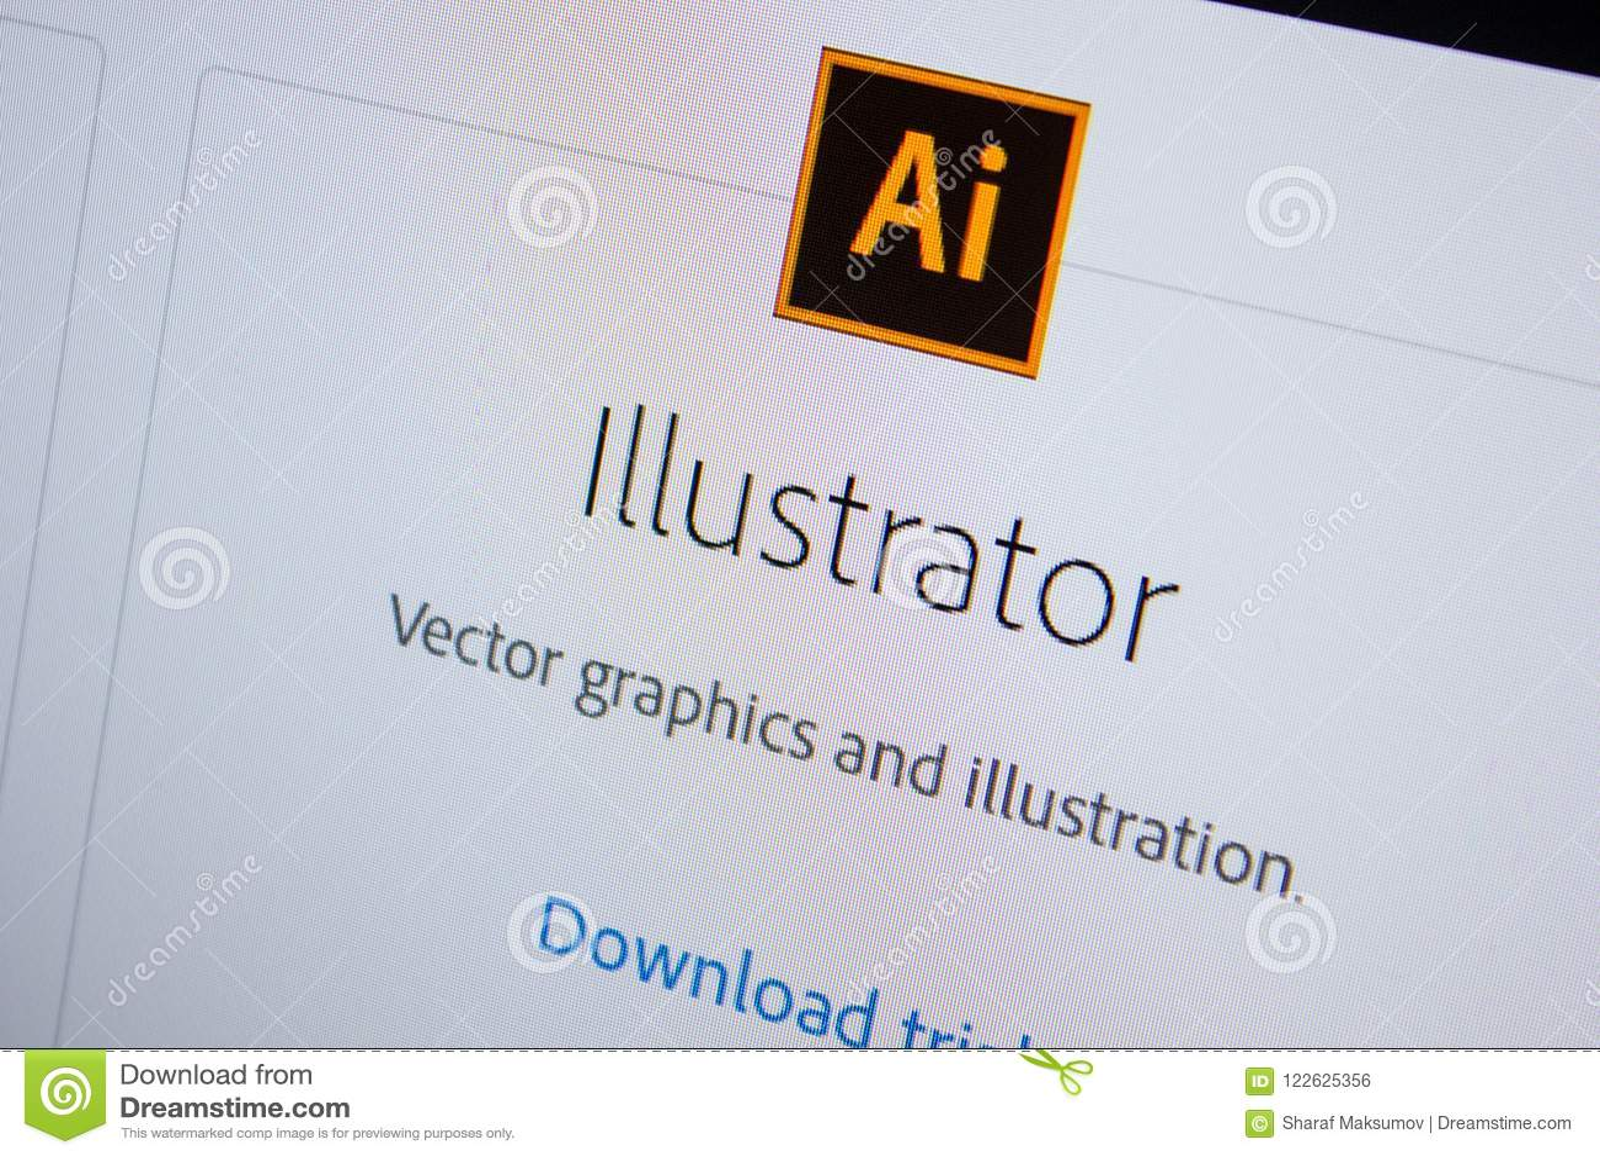 Ryazan, Russia - July 11, 2018: Adobe Illustrator, Software